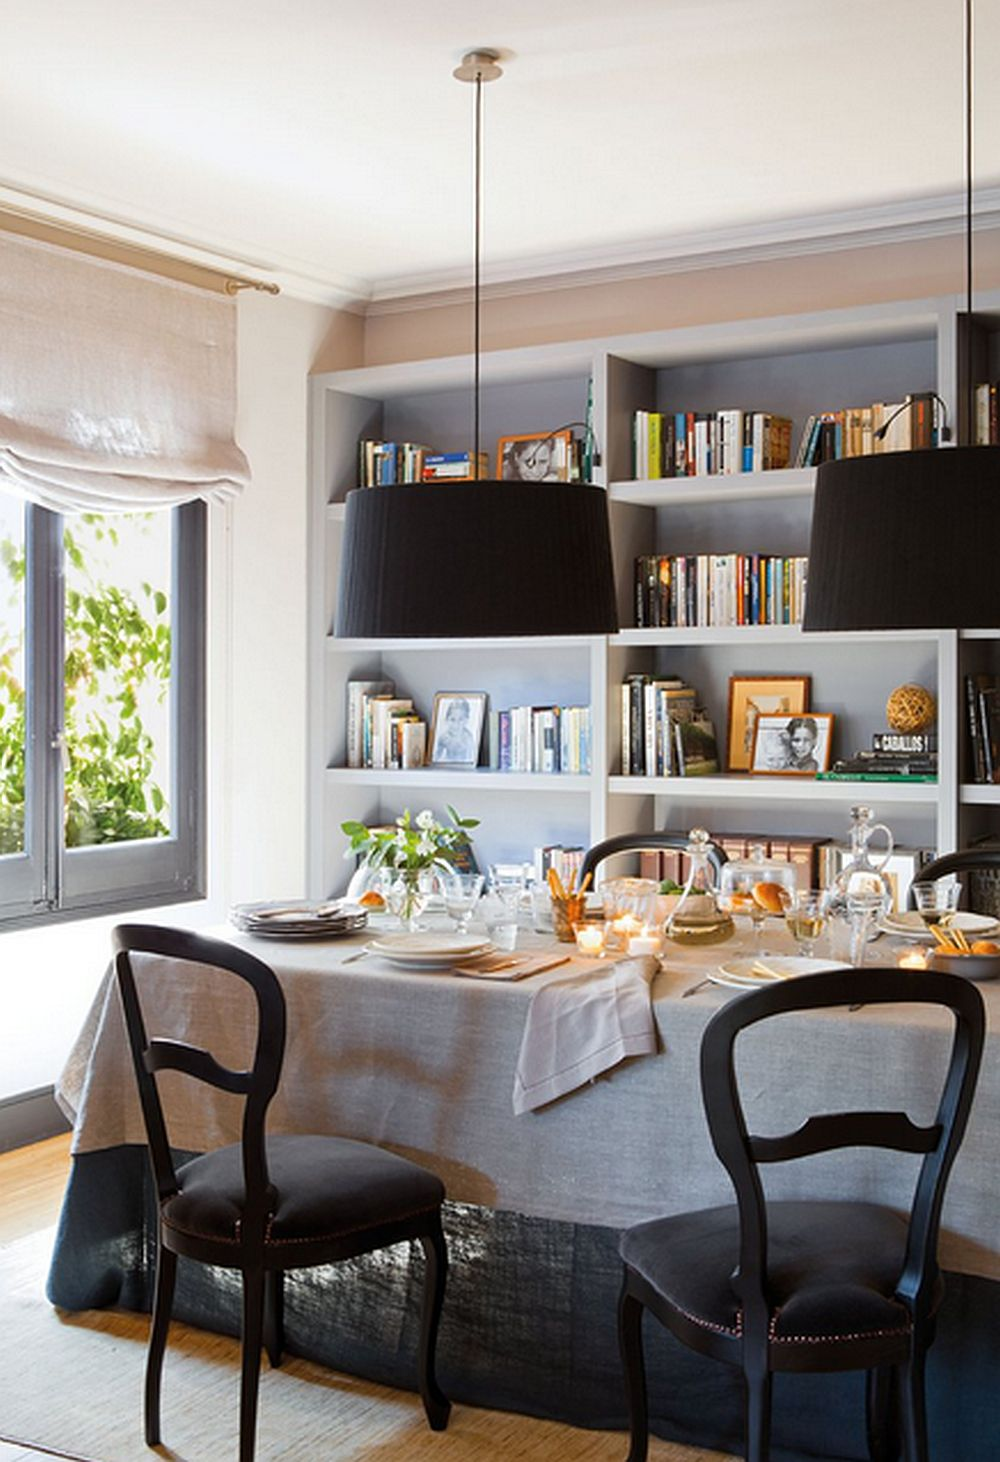 adelaparvu.com despre casa designerului Barbara Sindreu Foto ElMueble (8)